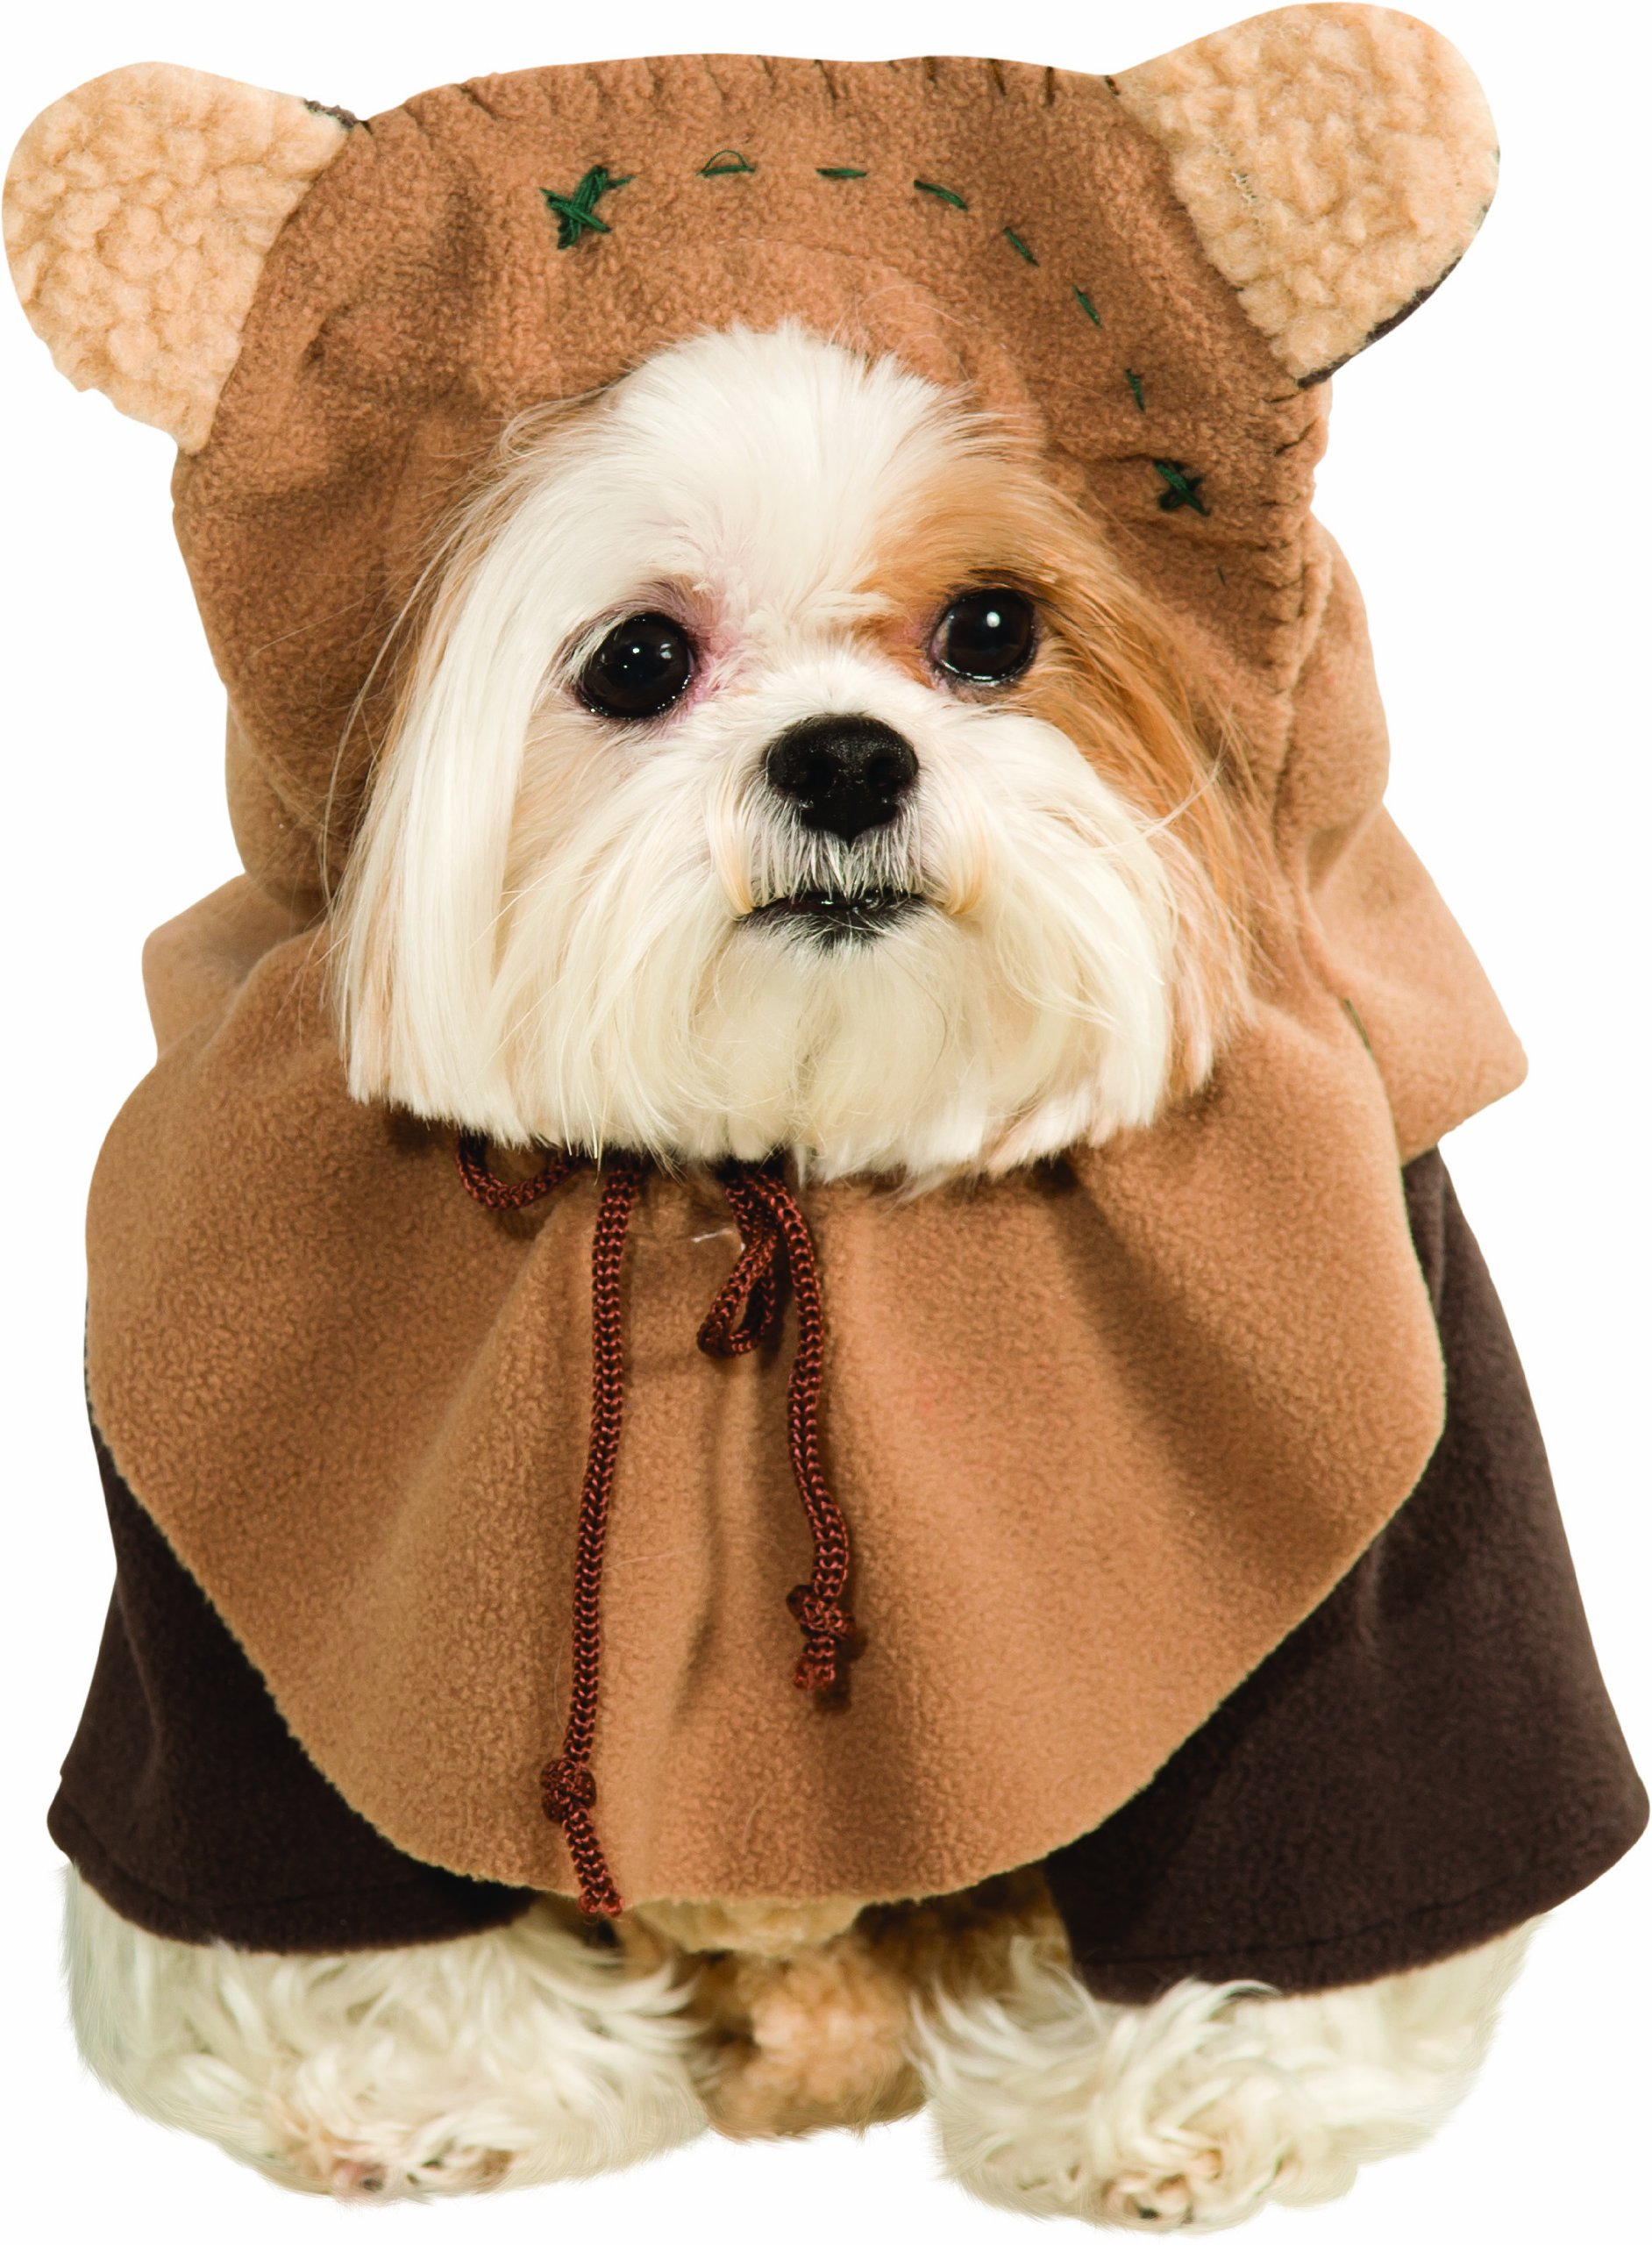 Rubie's Star Wars Collection Pet Costume, Medium, Ewok